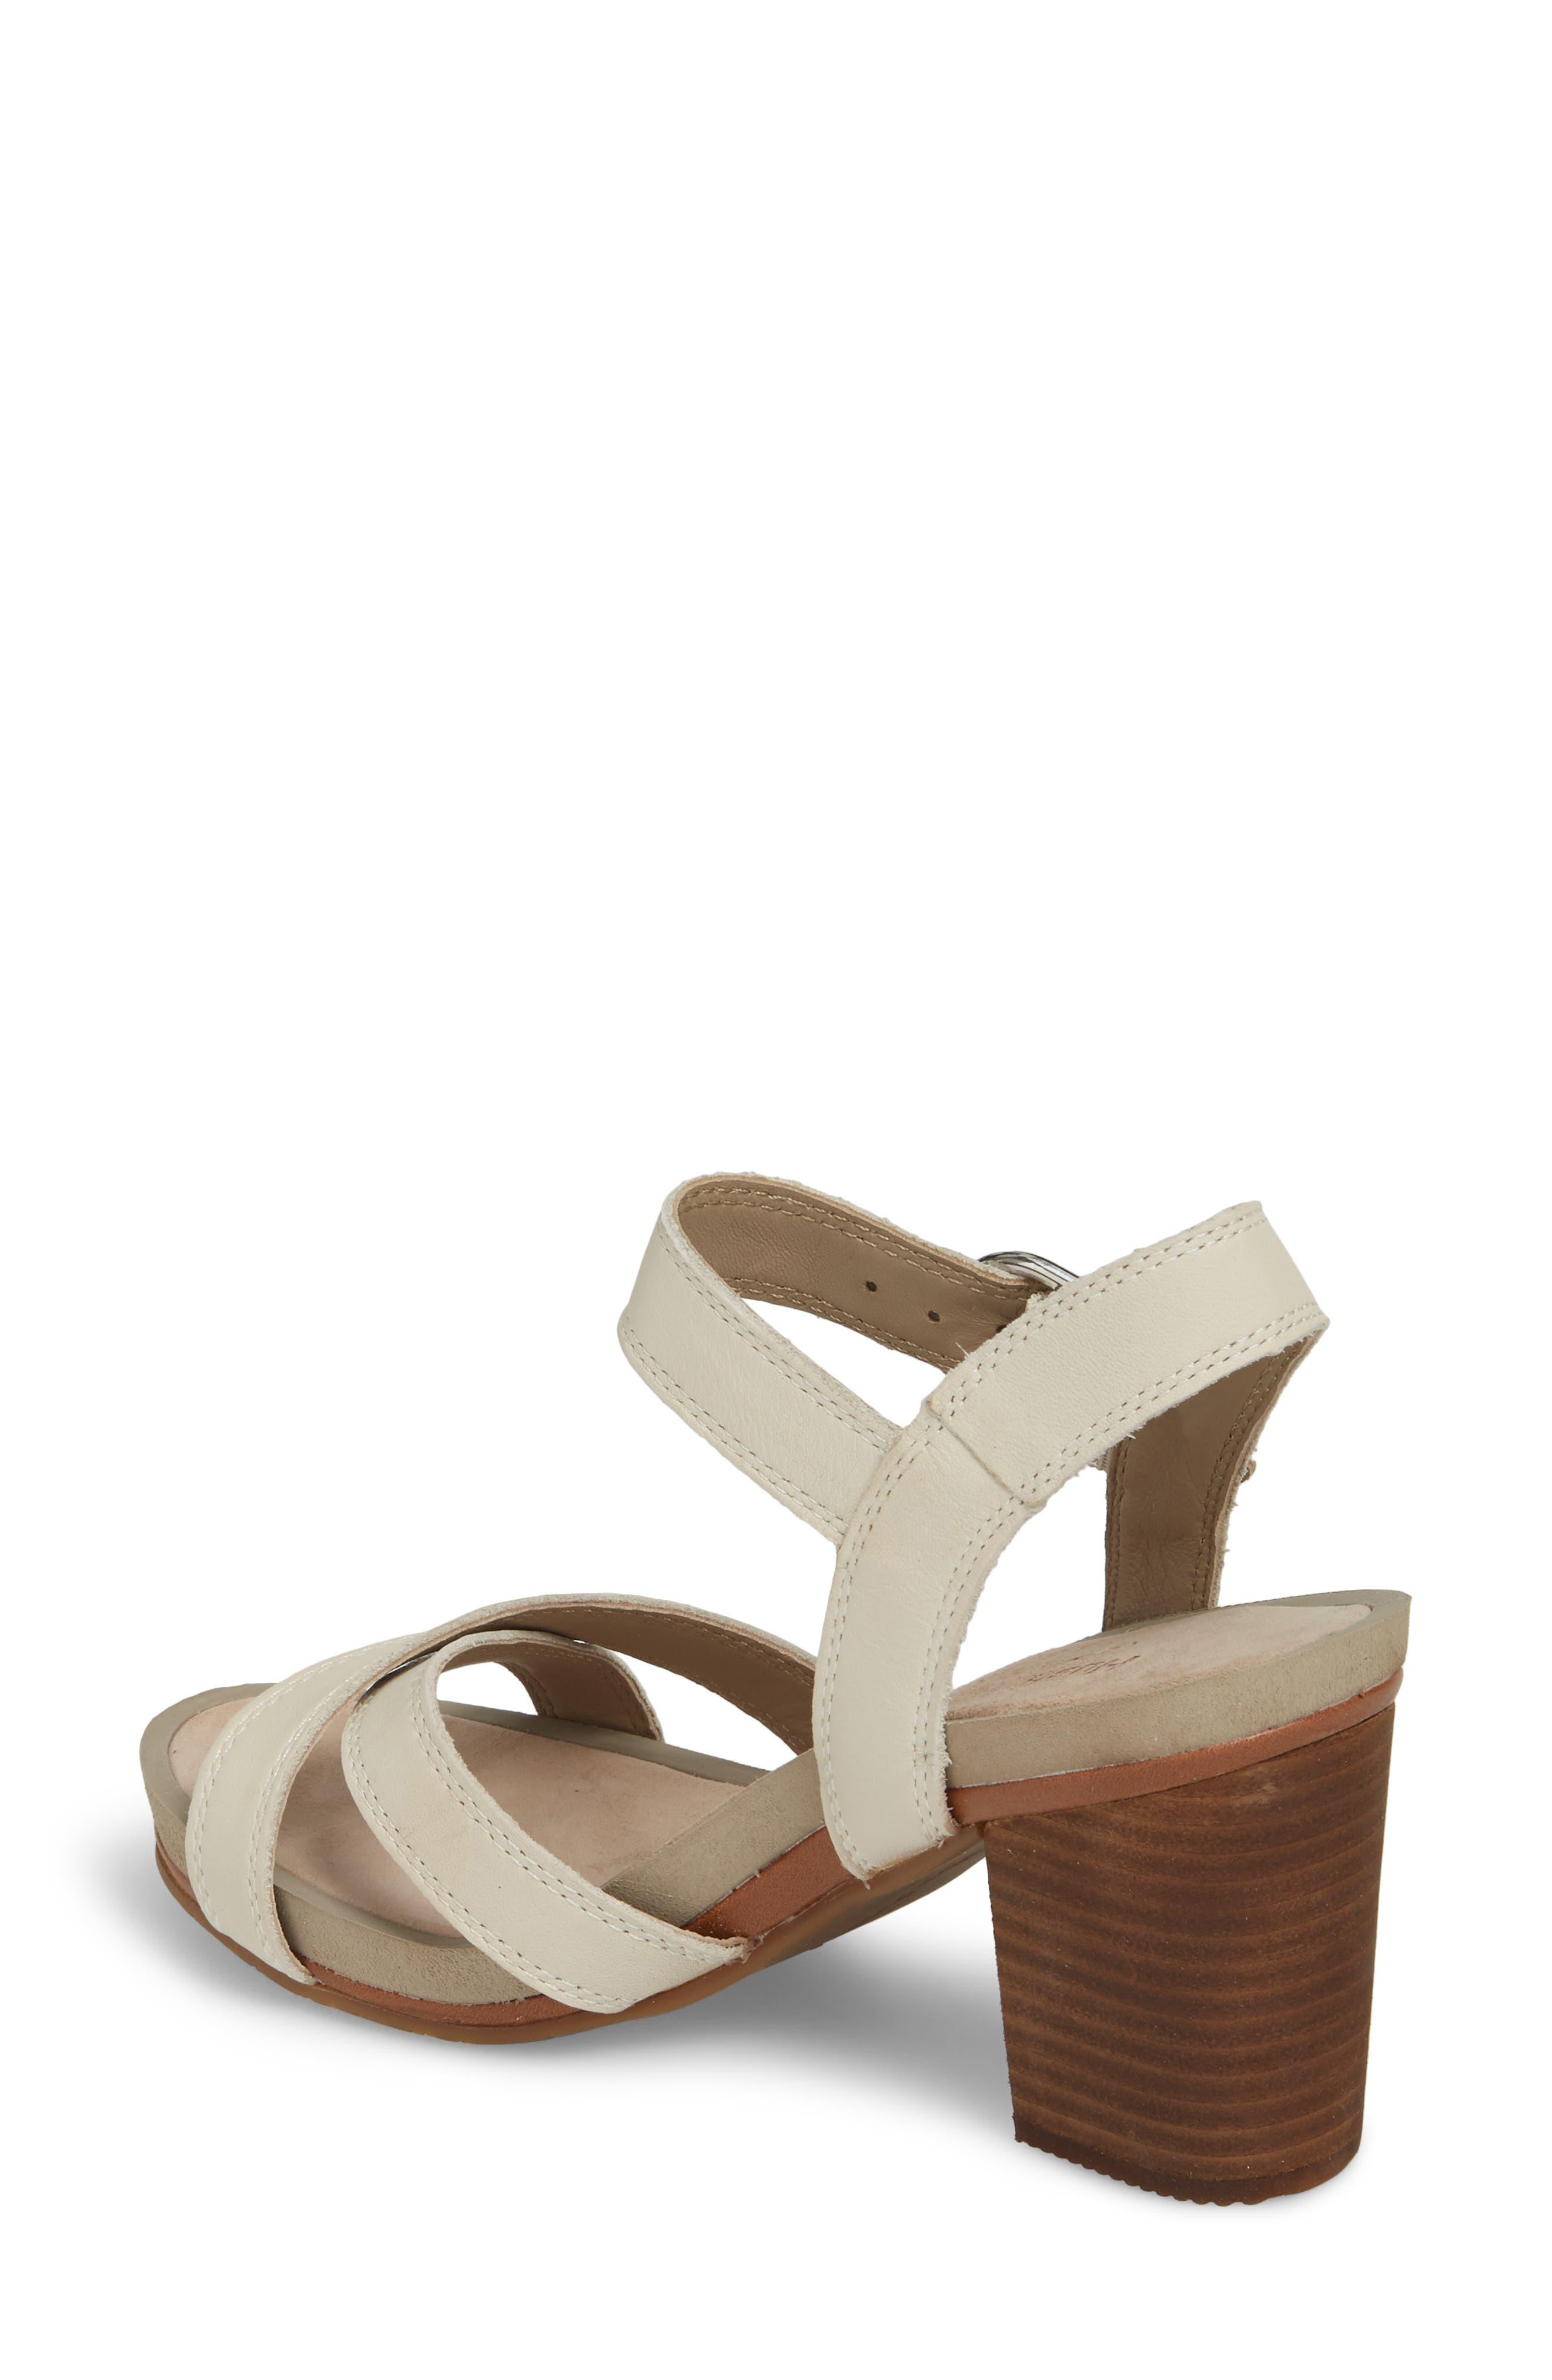 Mariska Block Heel Sandal,                             Alternate thumbnail 4, color,